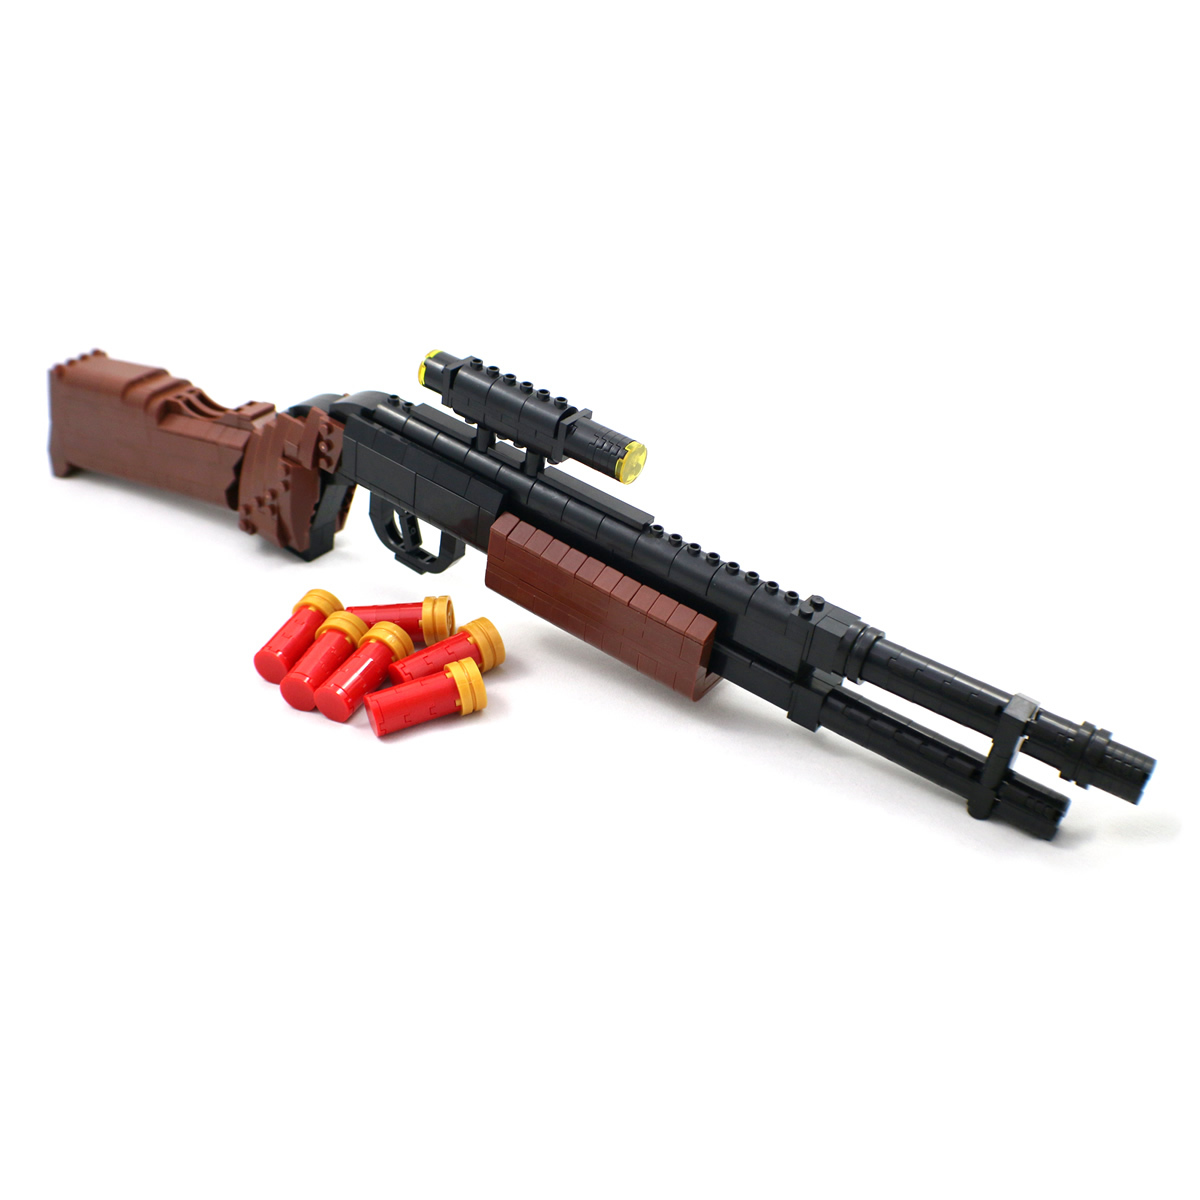 Model Shotgun Building Block Gun Compatible With Lego